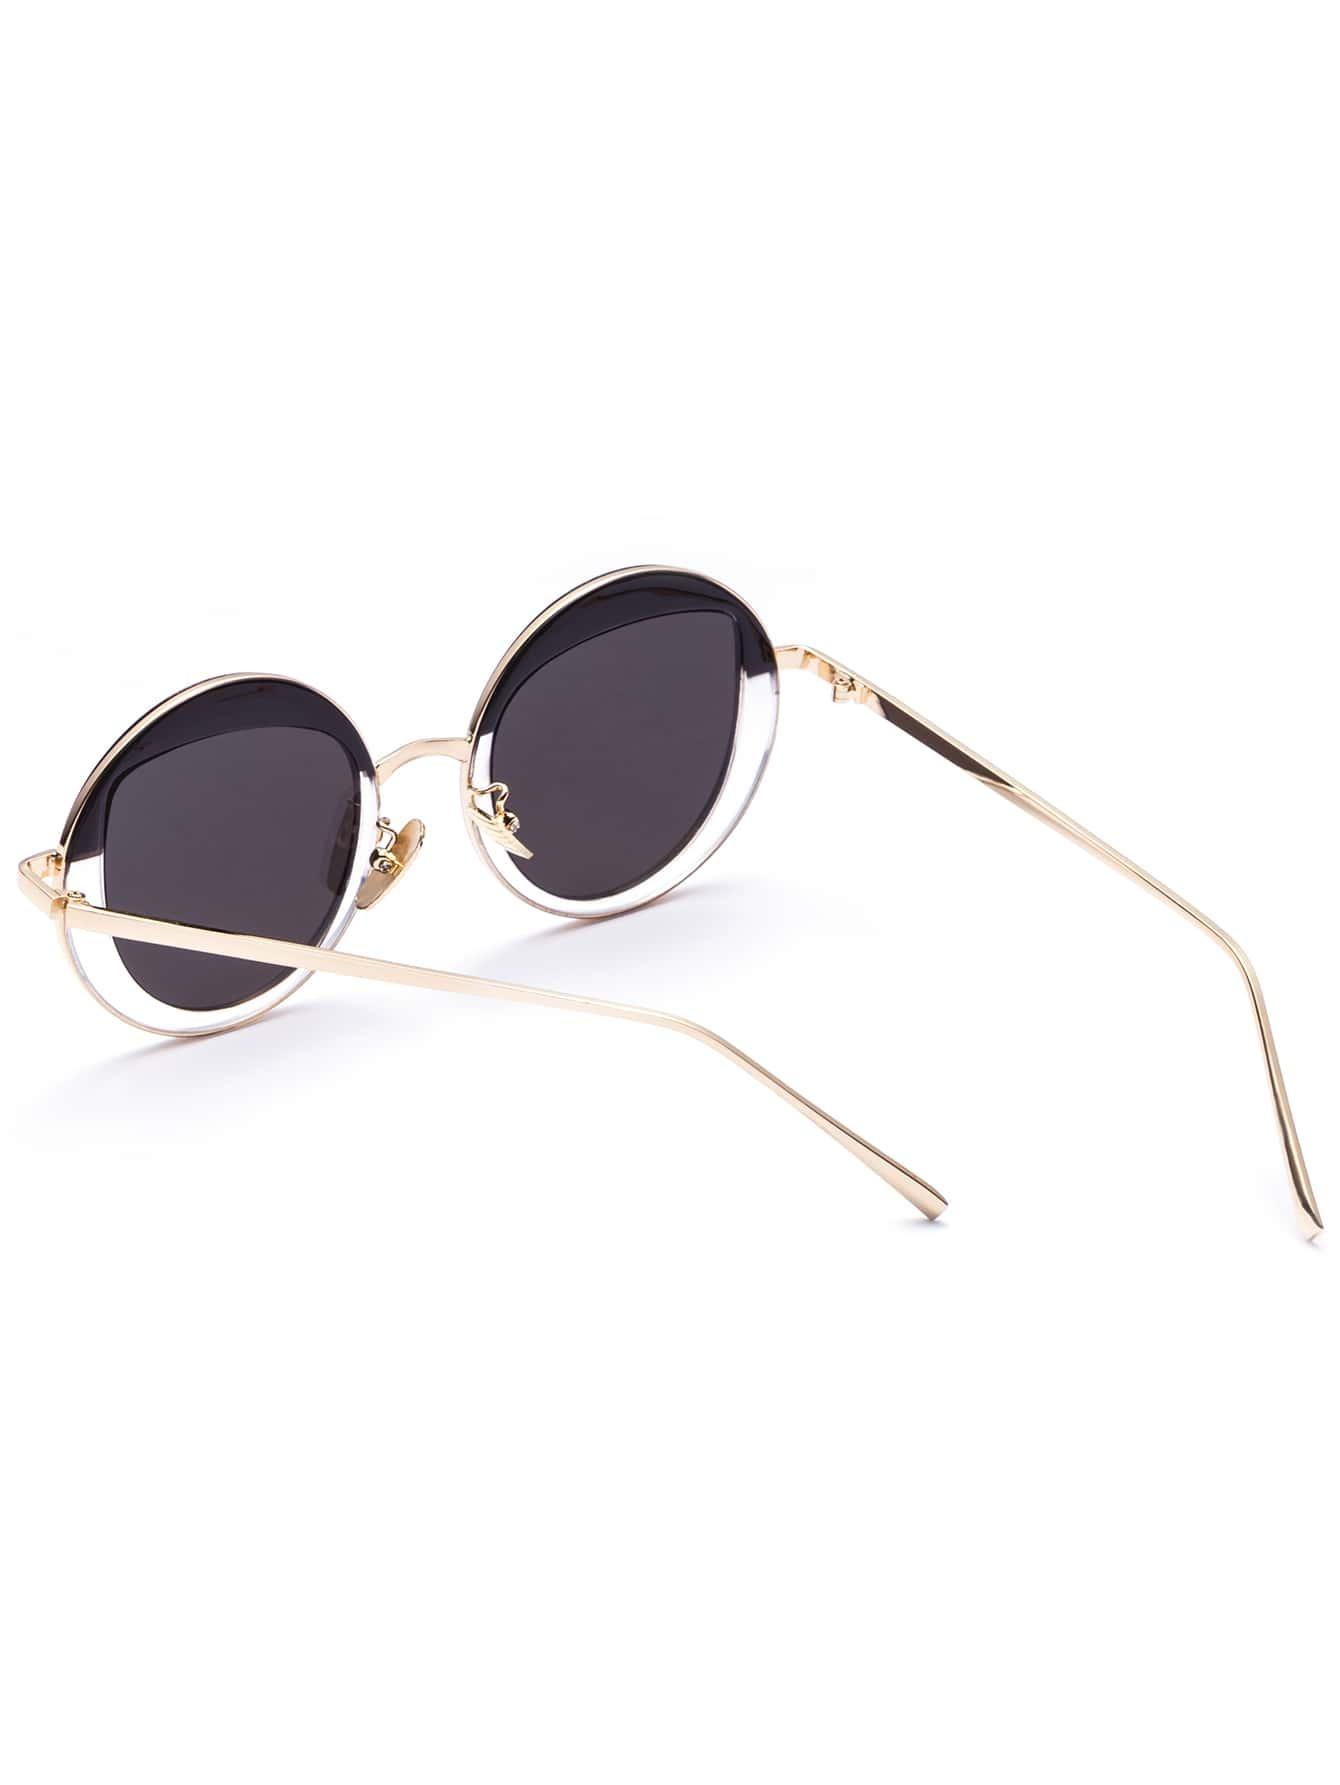 Gold Frame Chic Round SunglassesFor Women-romwe